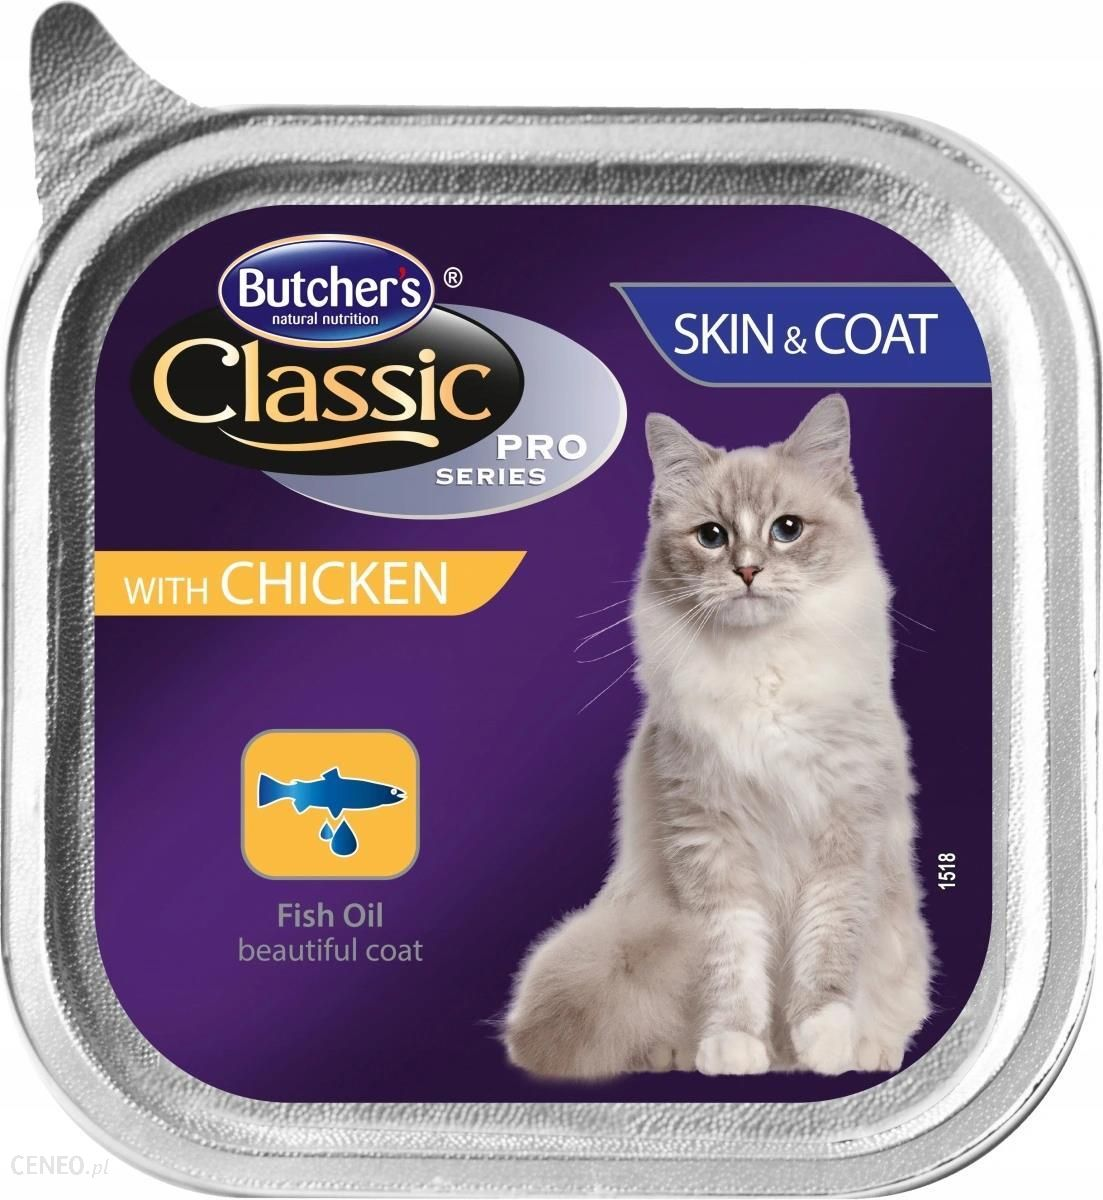 Butcher's Classic Pro Series Skin&Coat z kurczakiem 100g